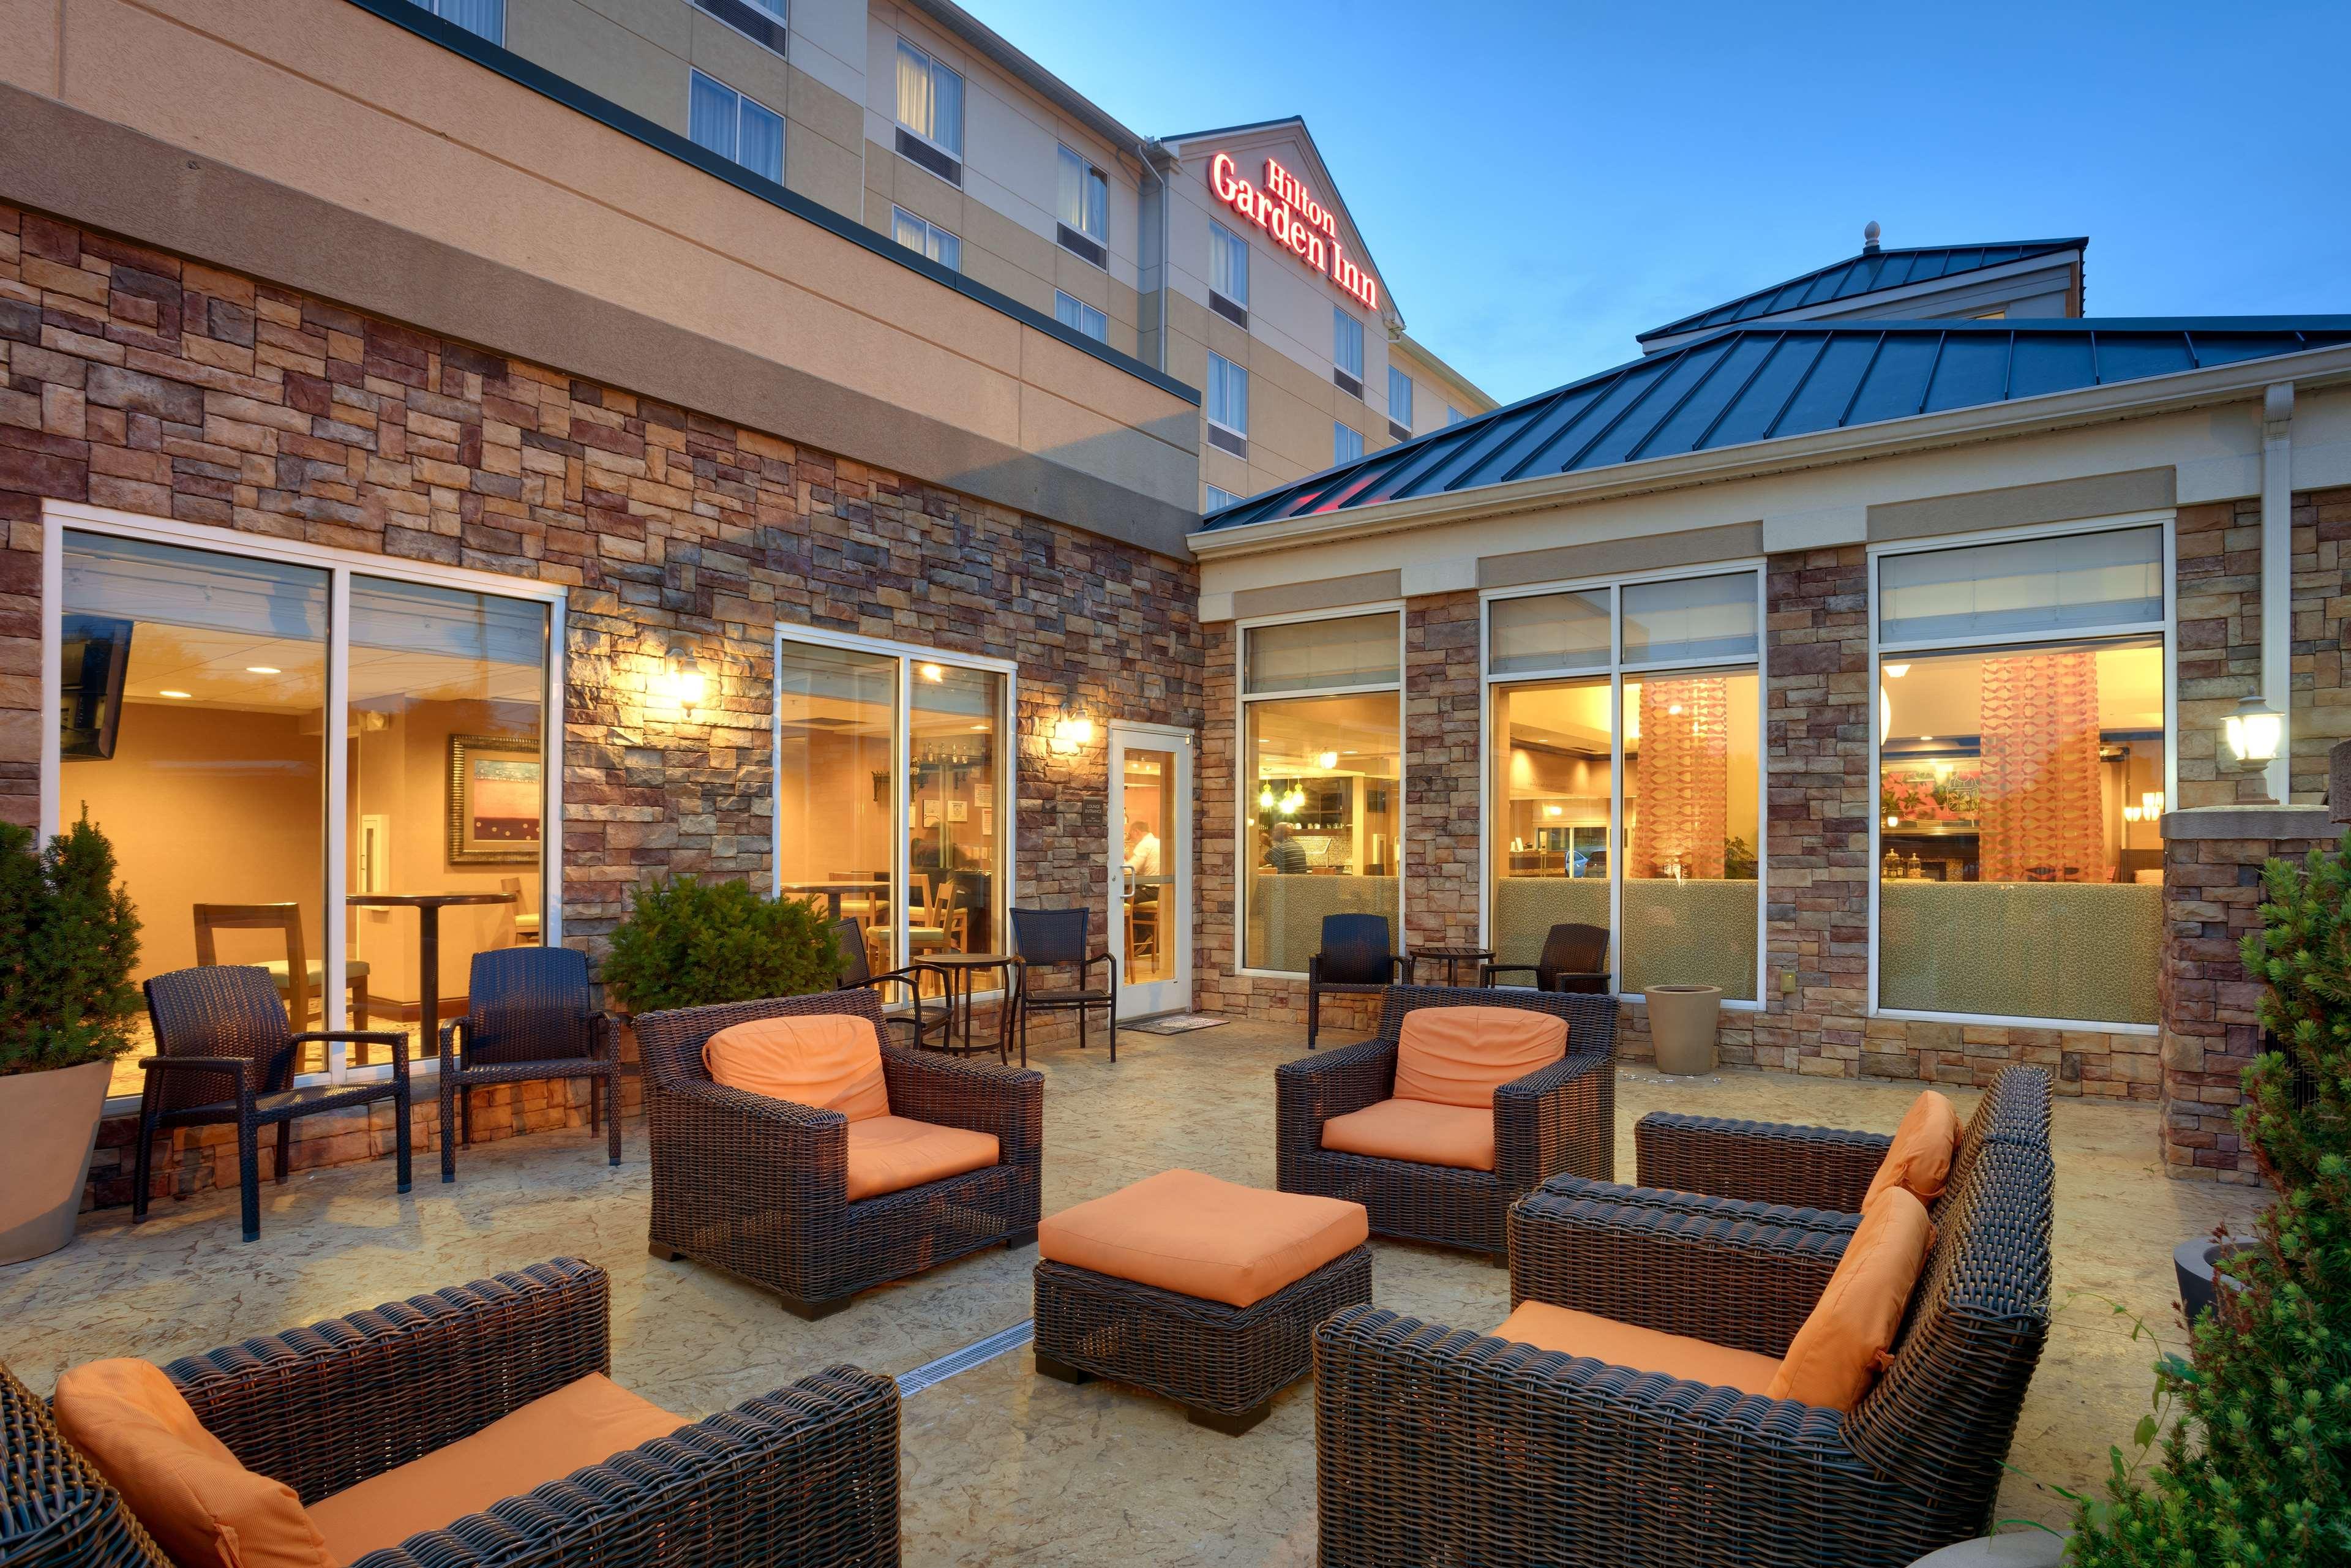 Hilton Garden Inn Clarksville image 0